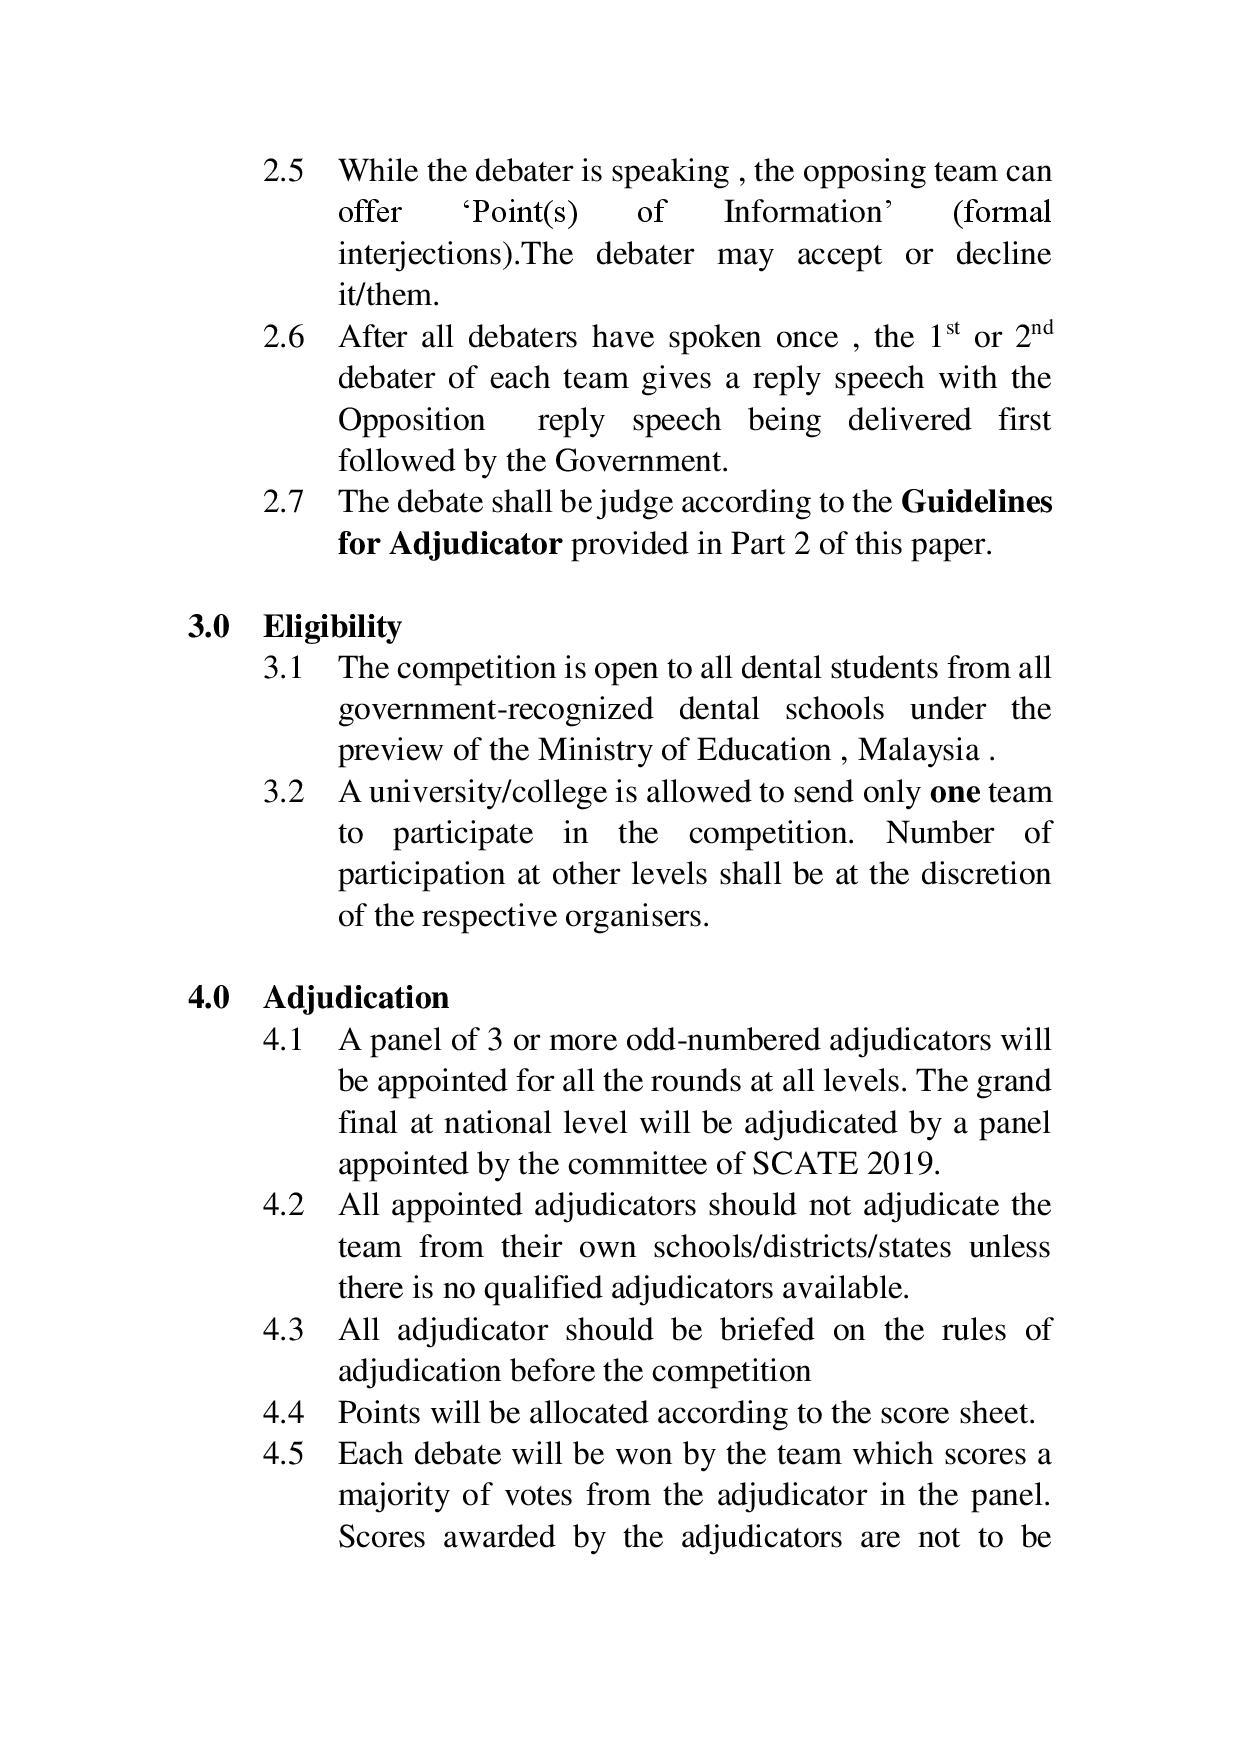 MALAYSIAN DENTAL INTERVARSITY DEBATE COMPETITION (Edited)-page-003.jpg